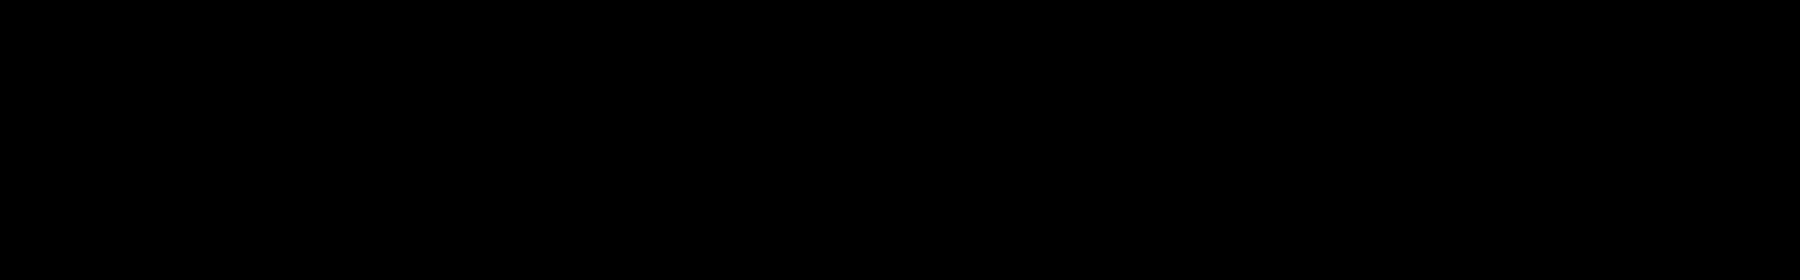 Ultra EDM 2015 audio waveform